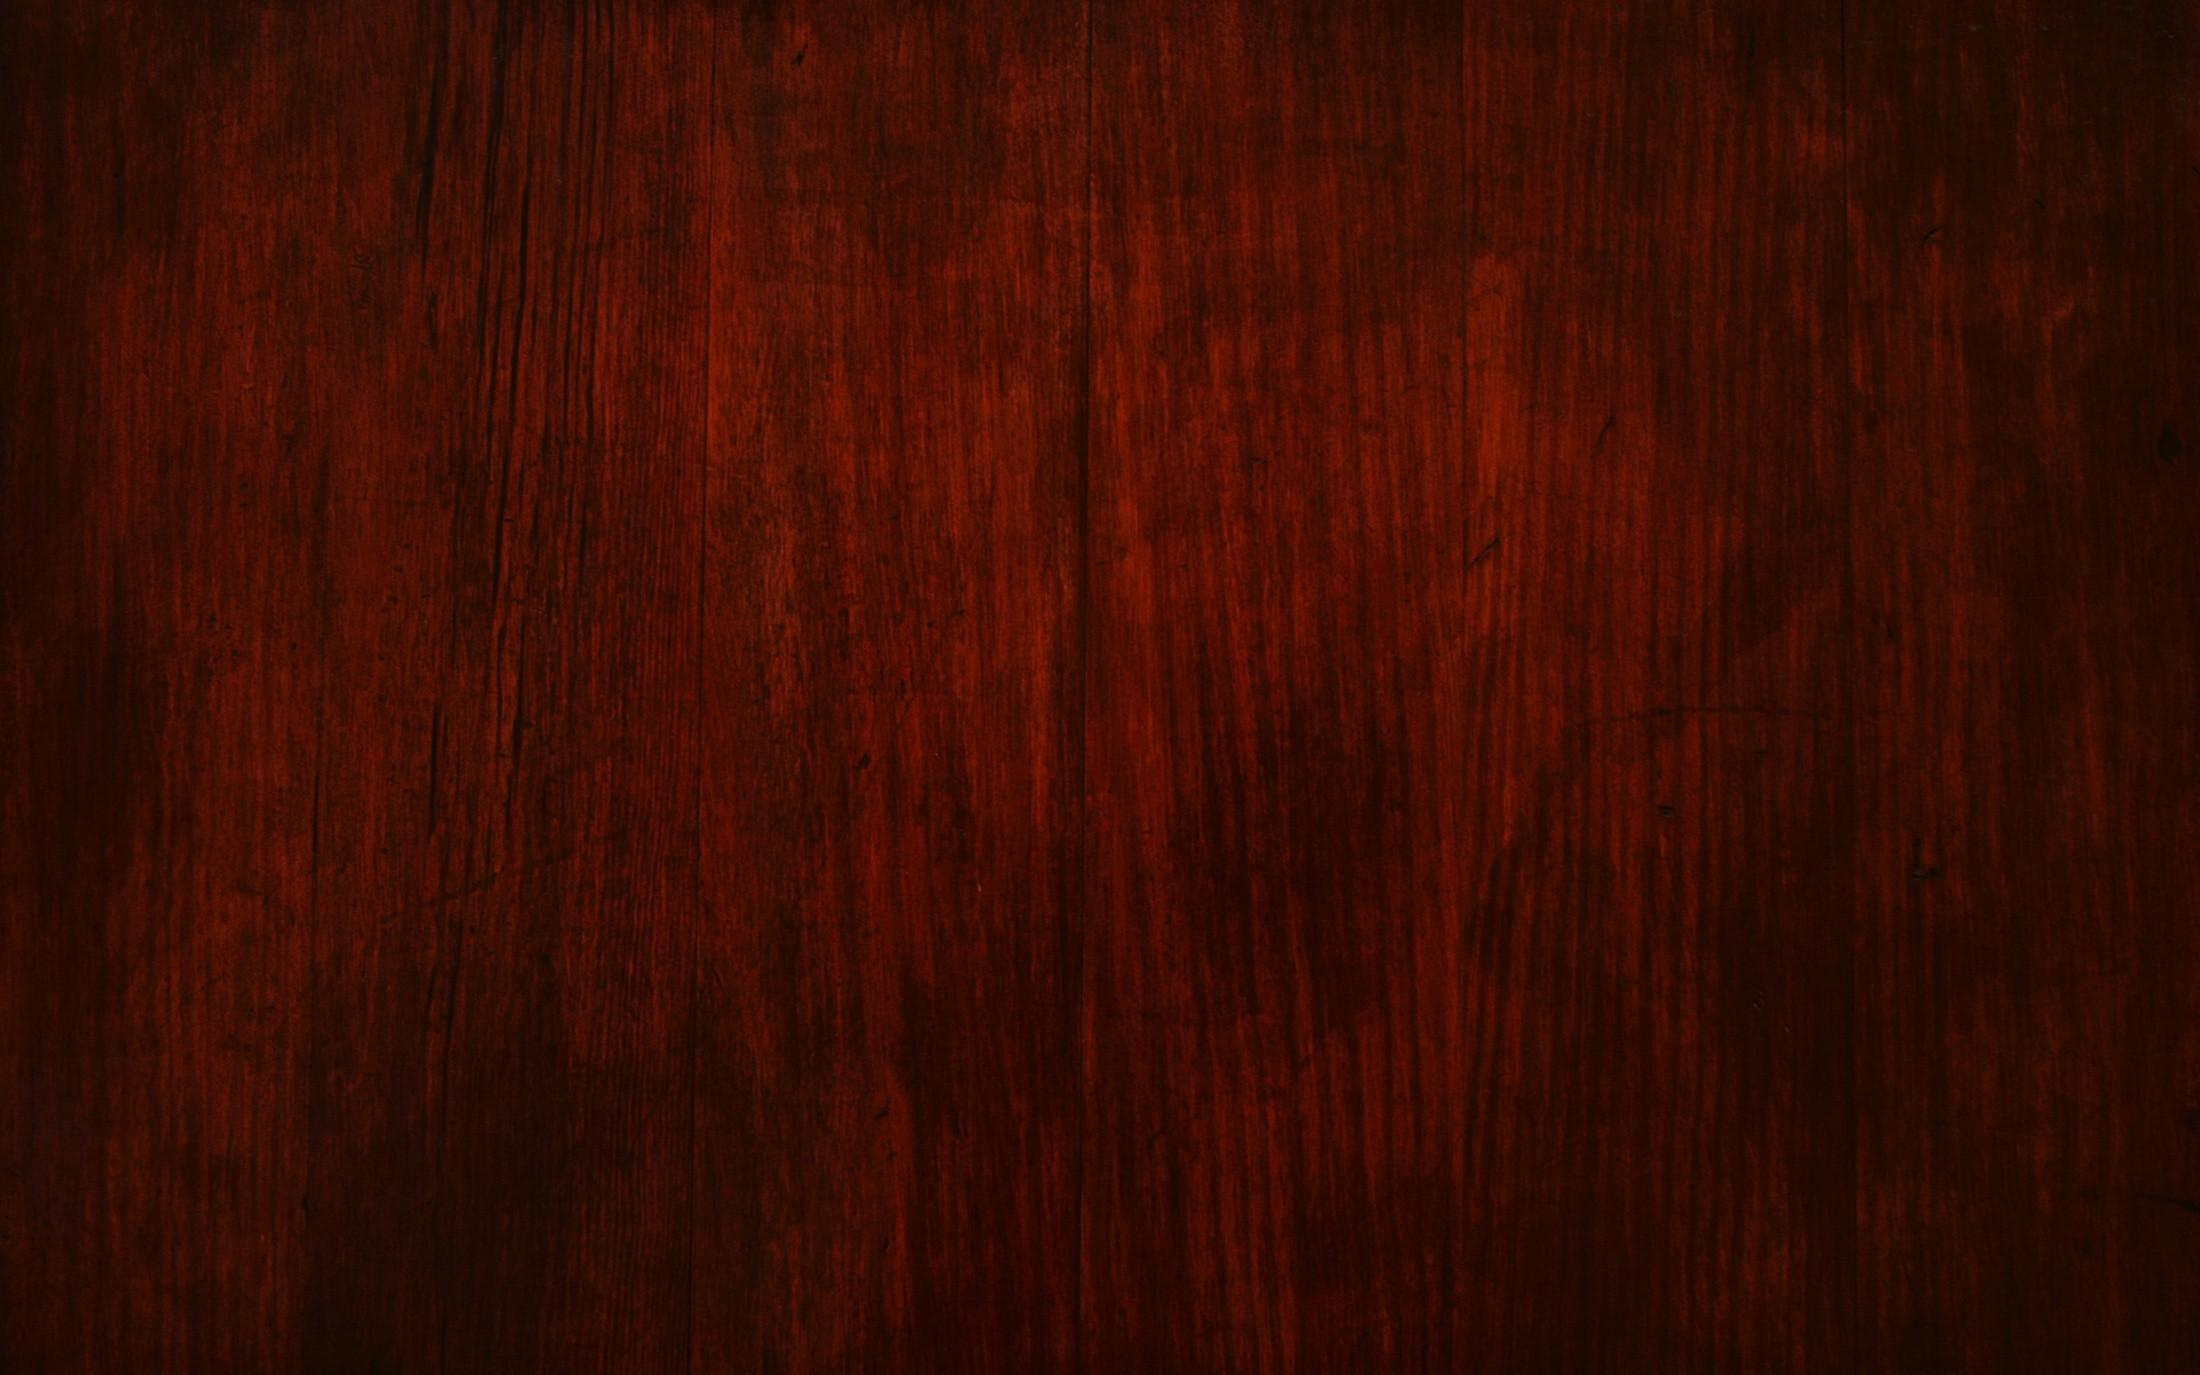 Natur Rot Holz Braun Textur Stock Hartholz Bodenbelag Holzboden Holzbeize  Laminatboden